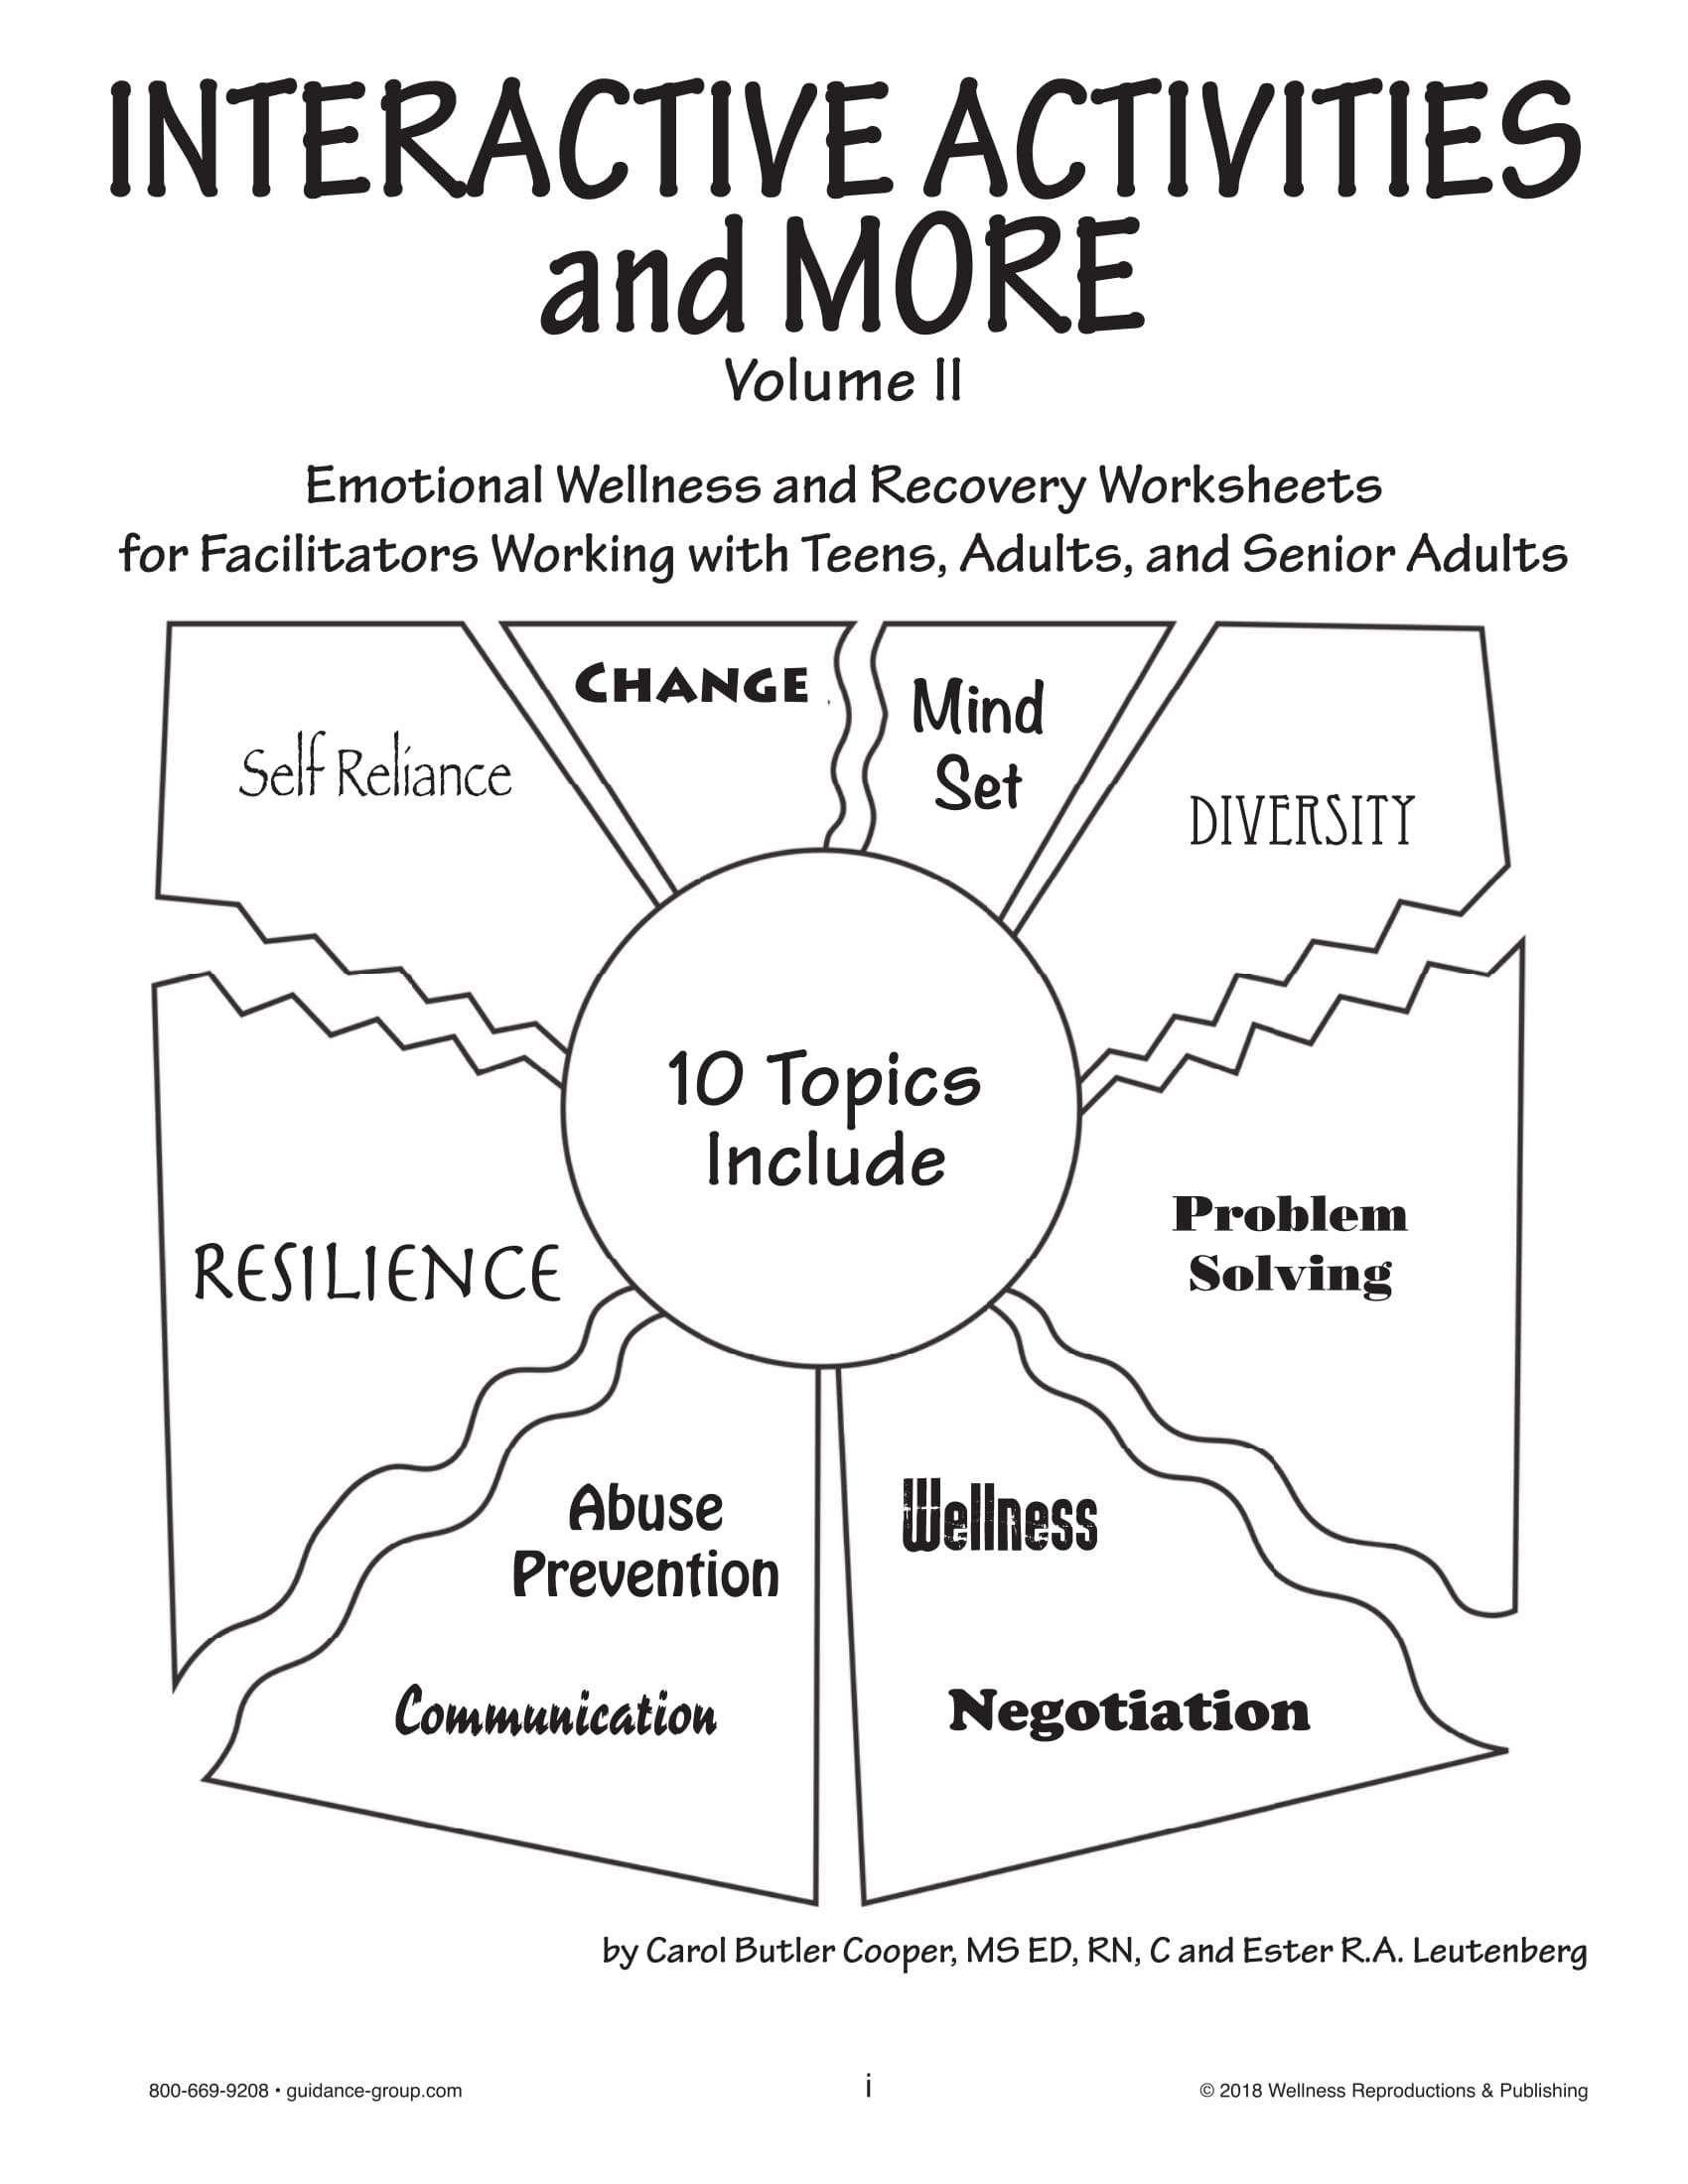 Social Skills Worksheets For Teens  Briefencounters With Social Skills Worksheets For Teens